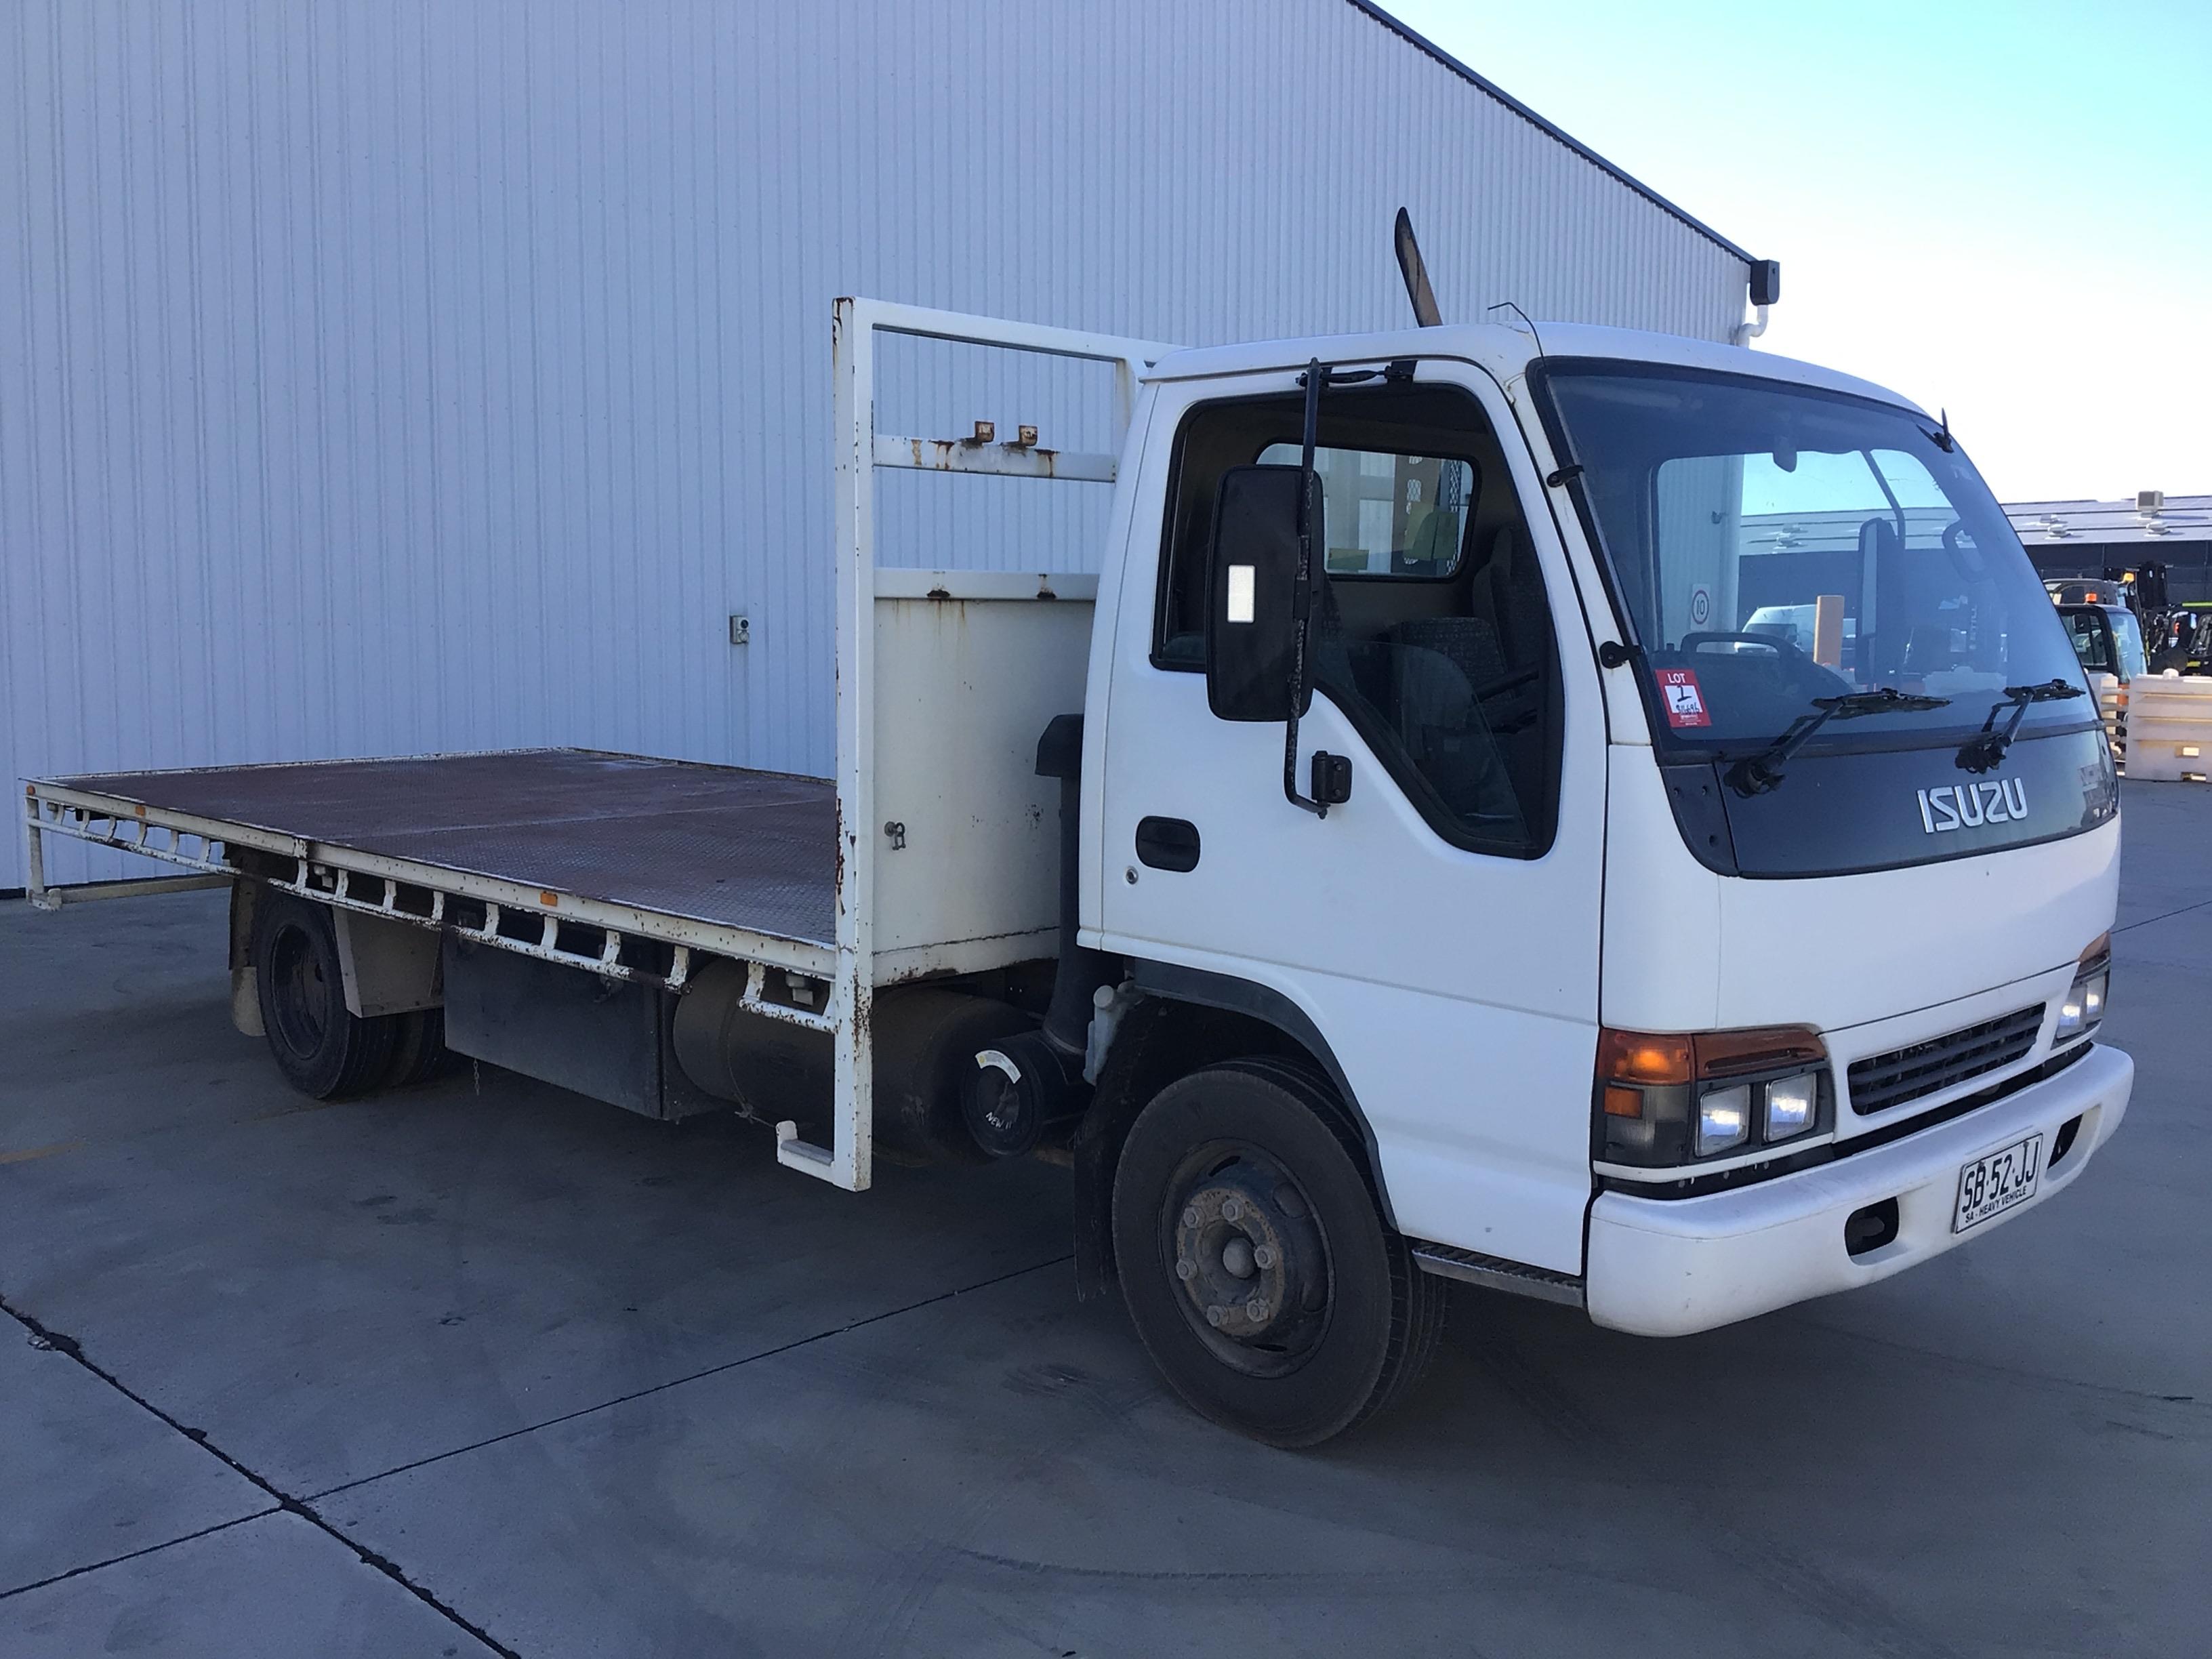 2001 Isuzu NQR450 4 x 2 Tray Body Truck